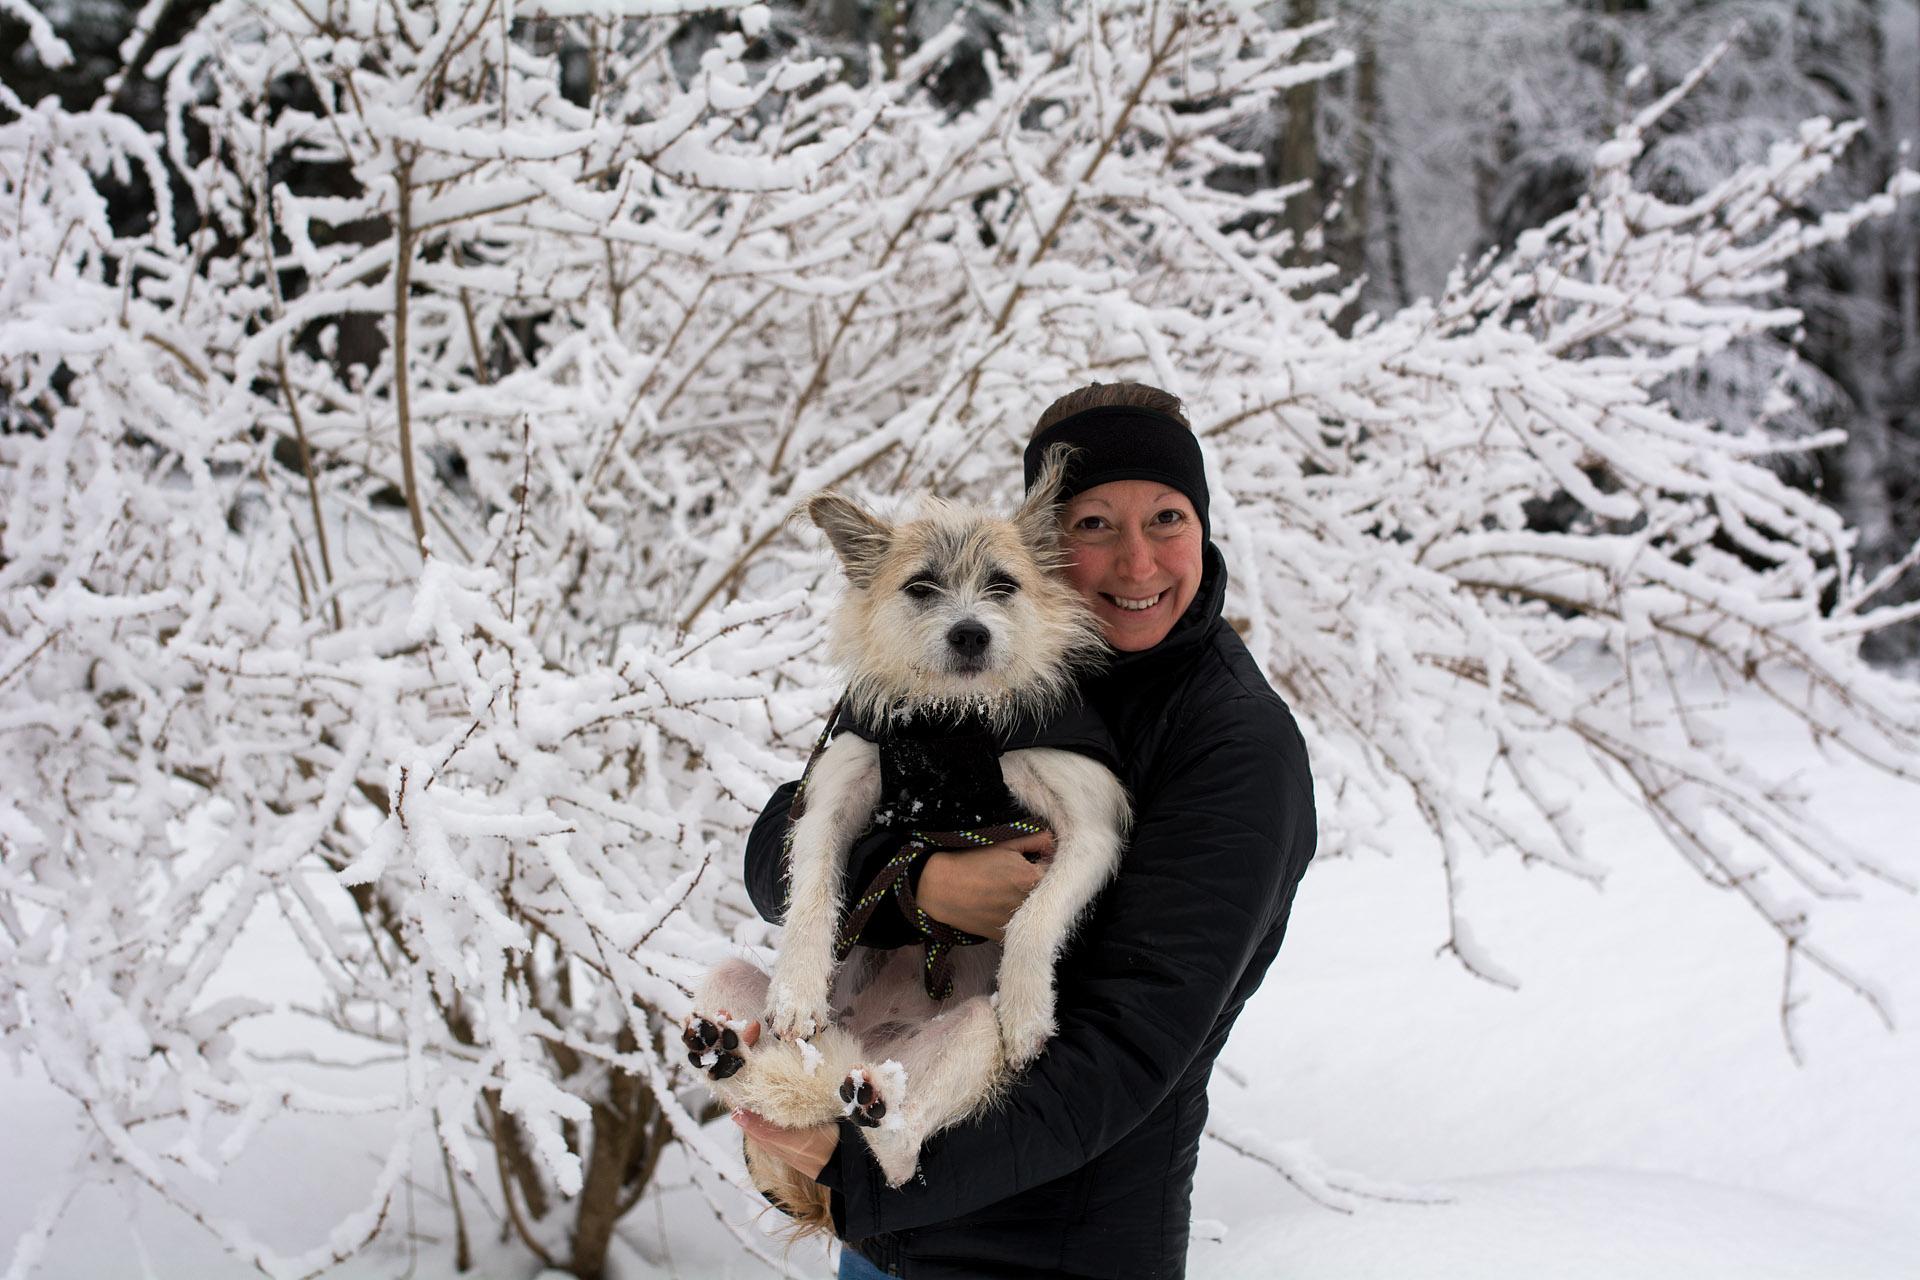 Wintertime in New Hampshire